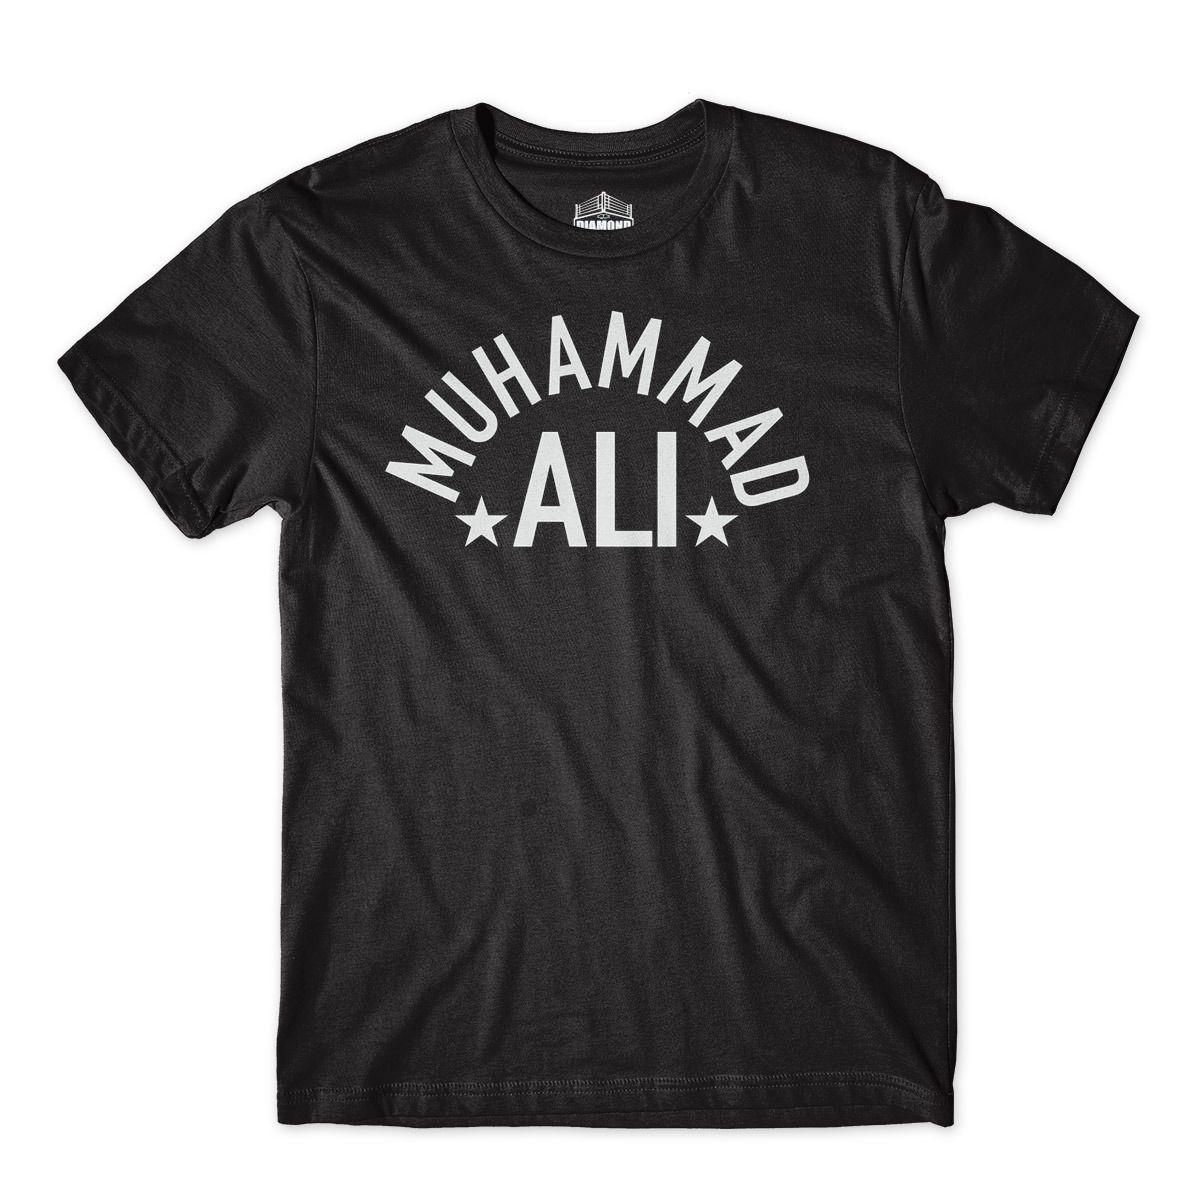 Camiseta muhammad ali Boxe lutador com Etiqueta Personalizada